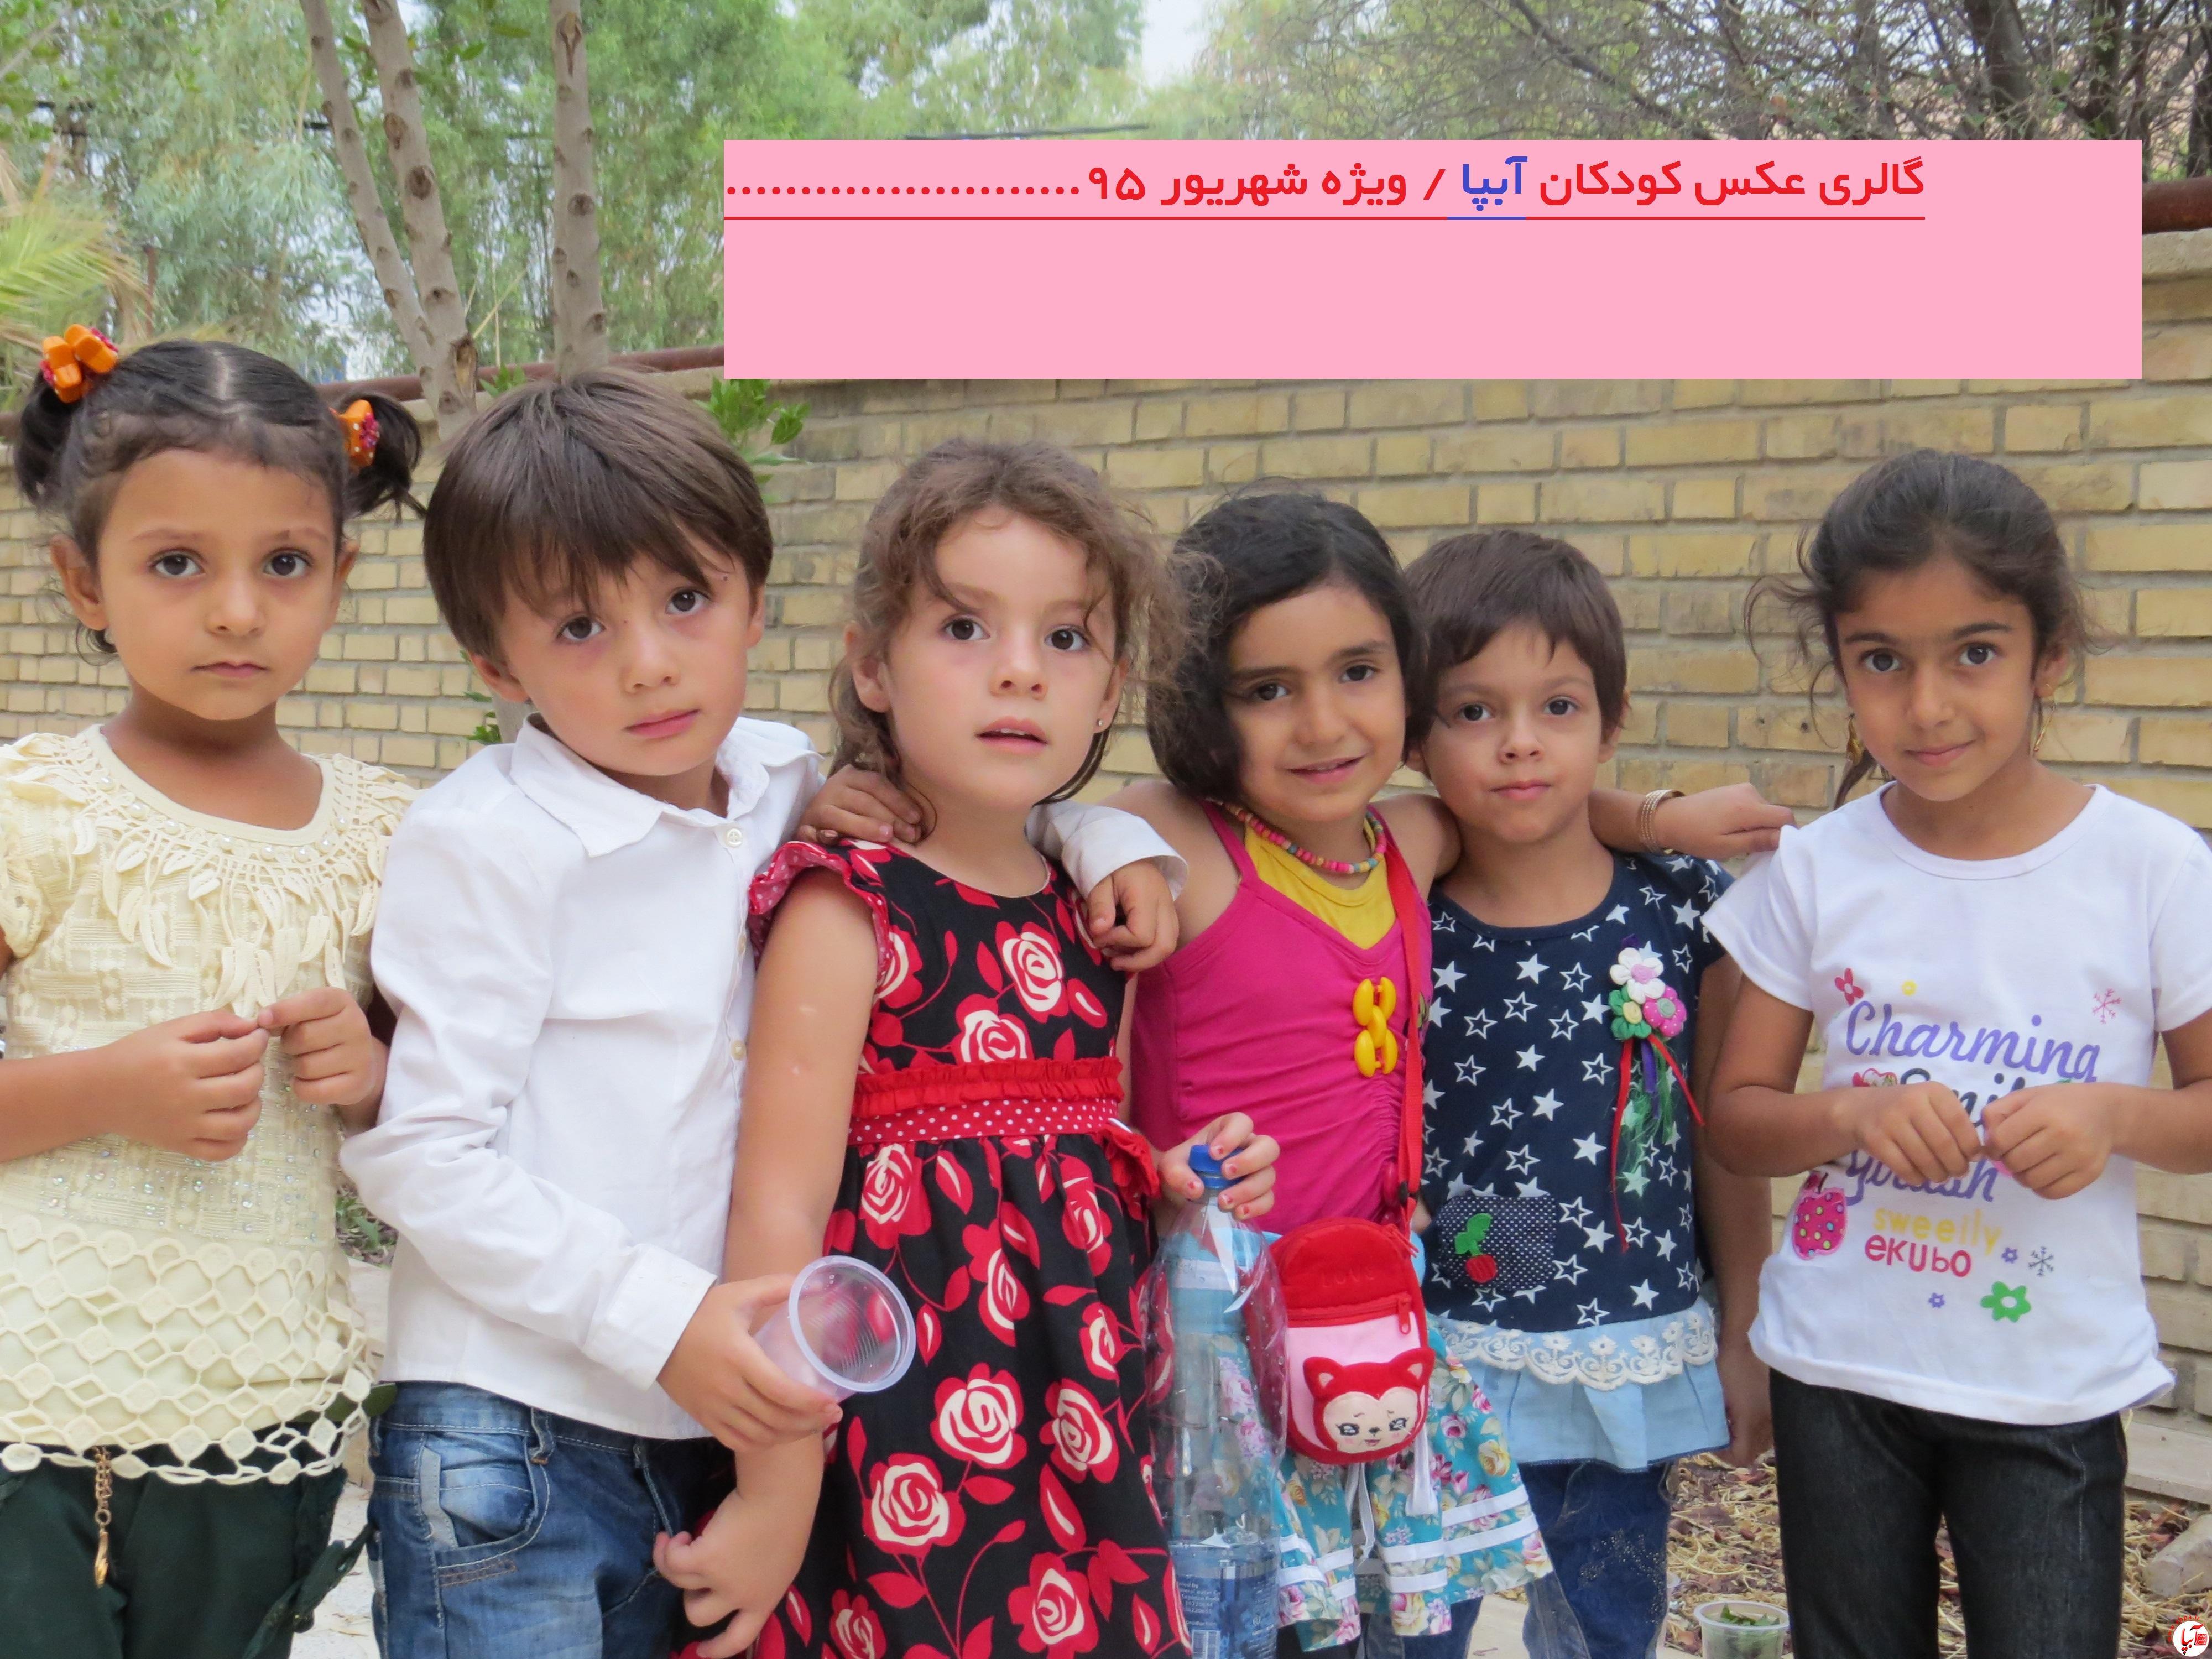 IMG 5078 - گالری تصاویر کودک/ ویژه شهریور ماه 95